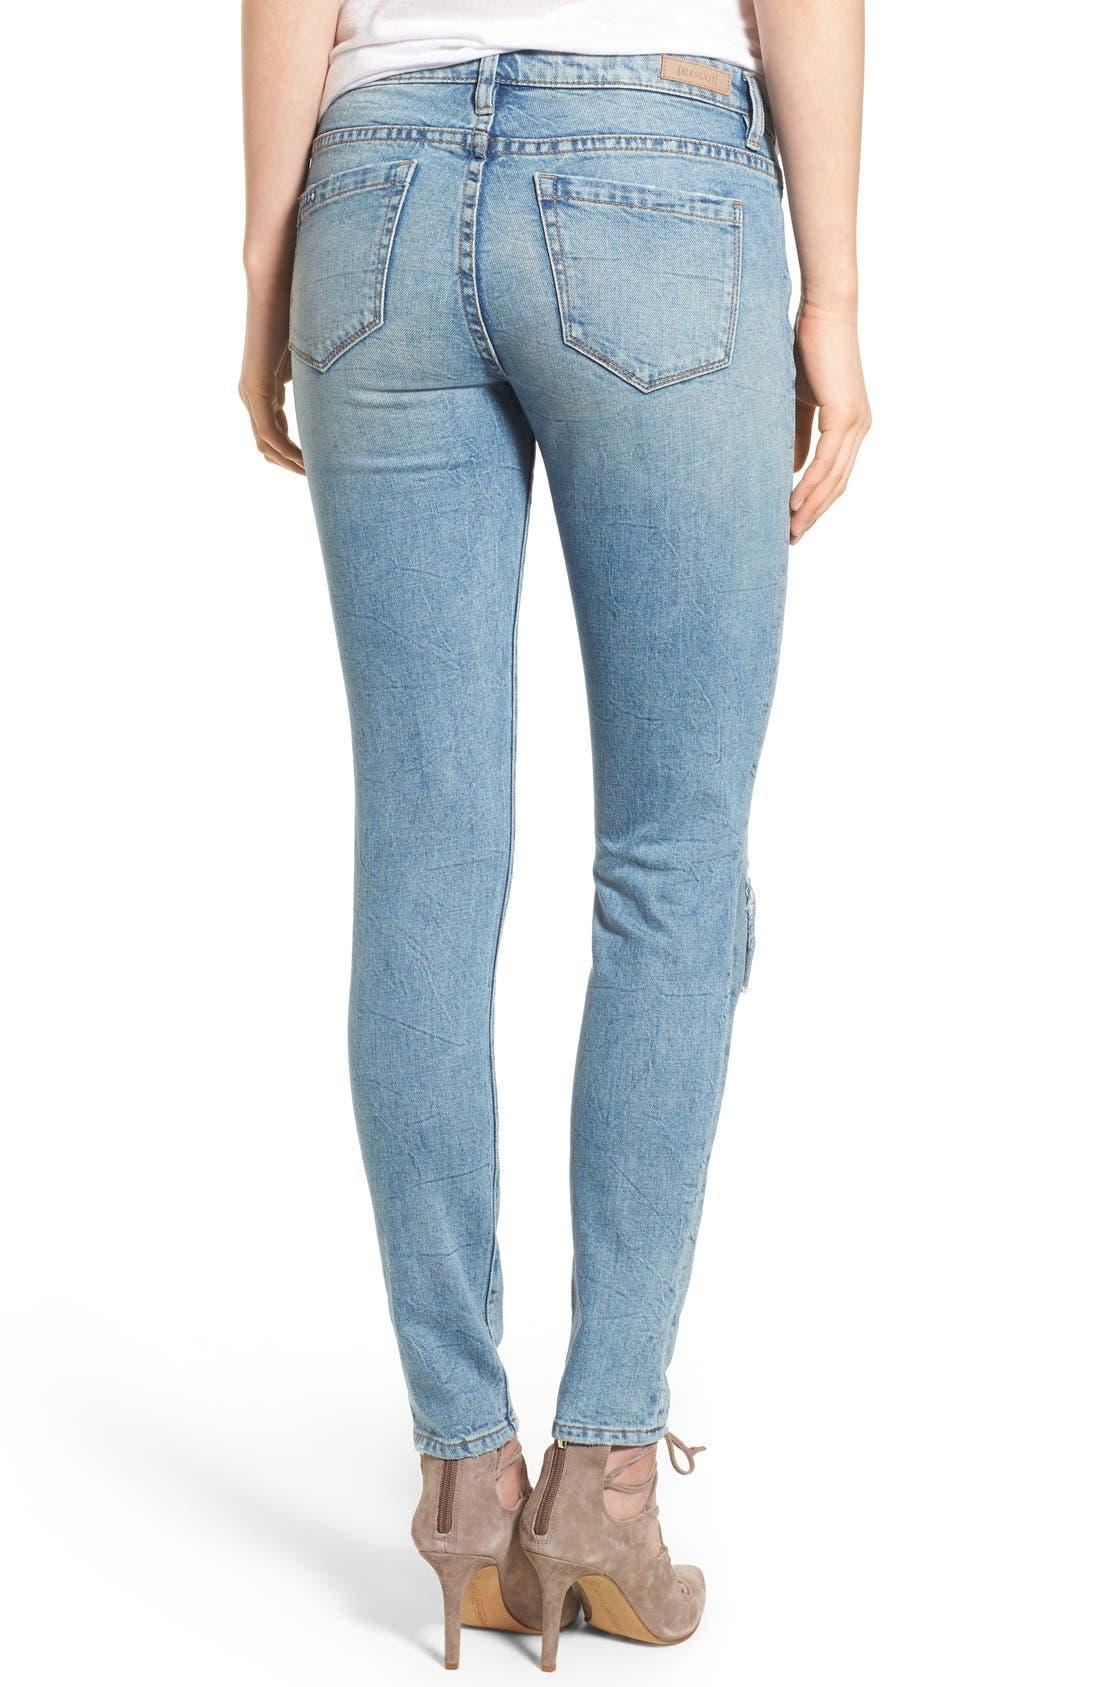 BLANKNYC, 'Skinny Dipper' Distressed Skinny Jeans, Alternate thumbnail 3, color, 400